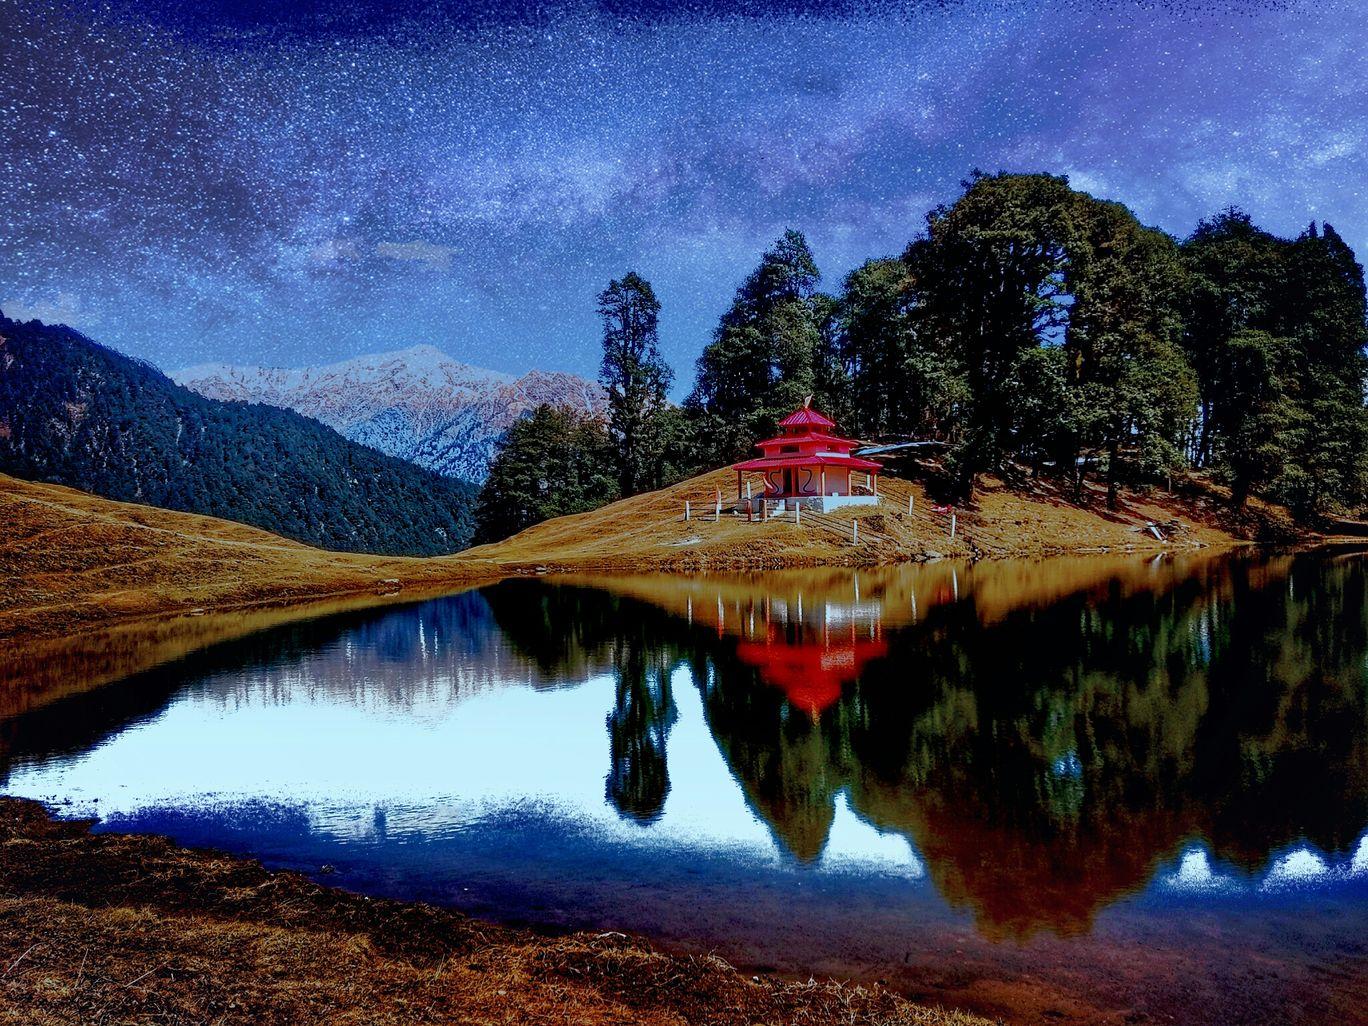 Photo of Raithal Homestay™ By Vishal Kuriyal